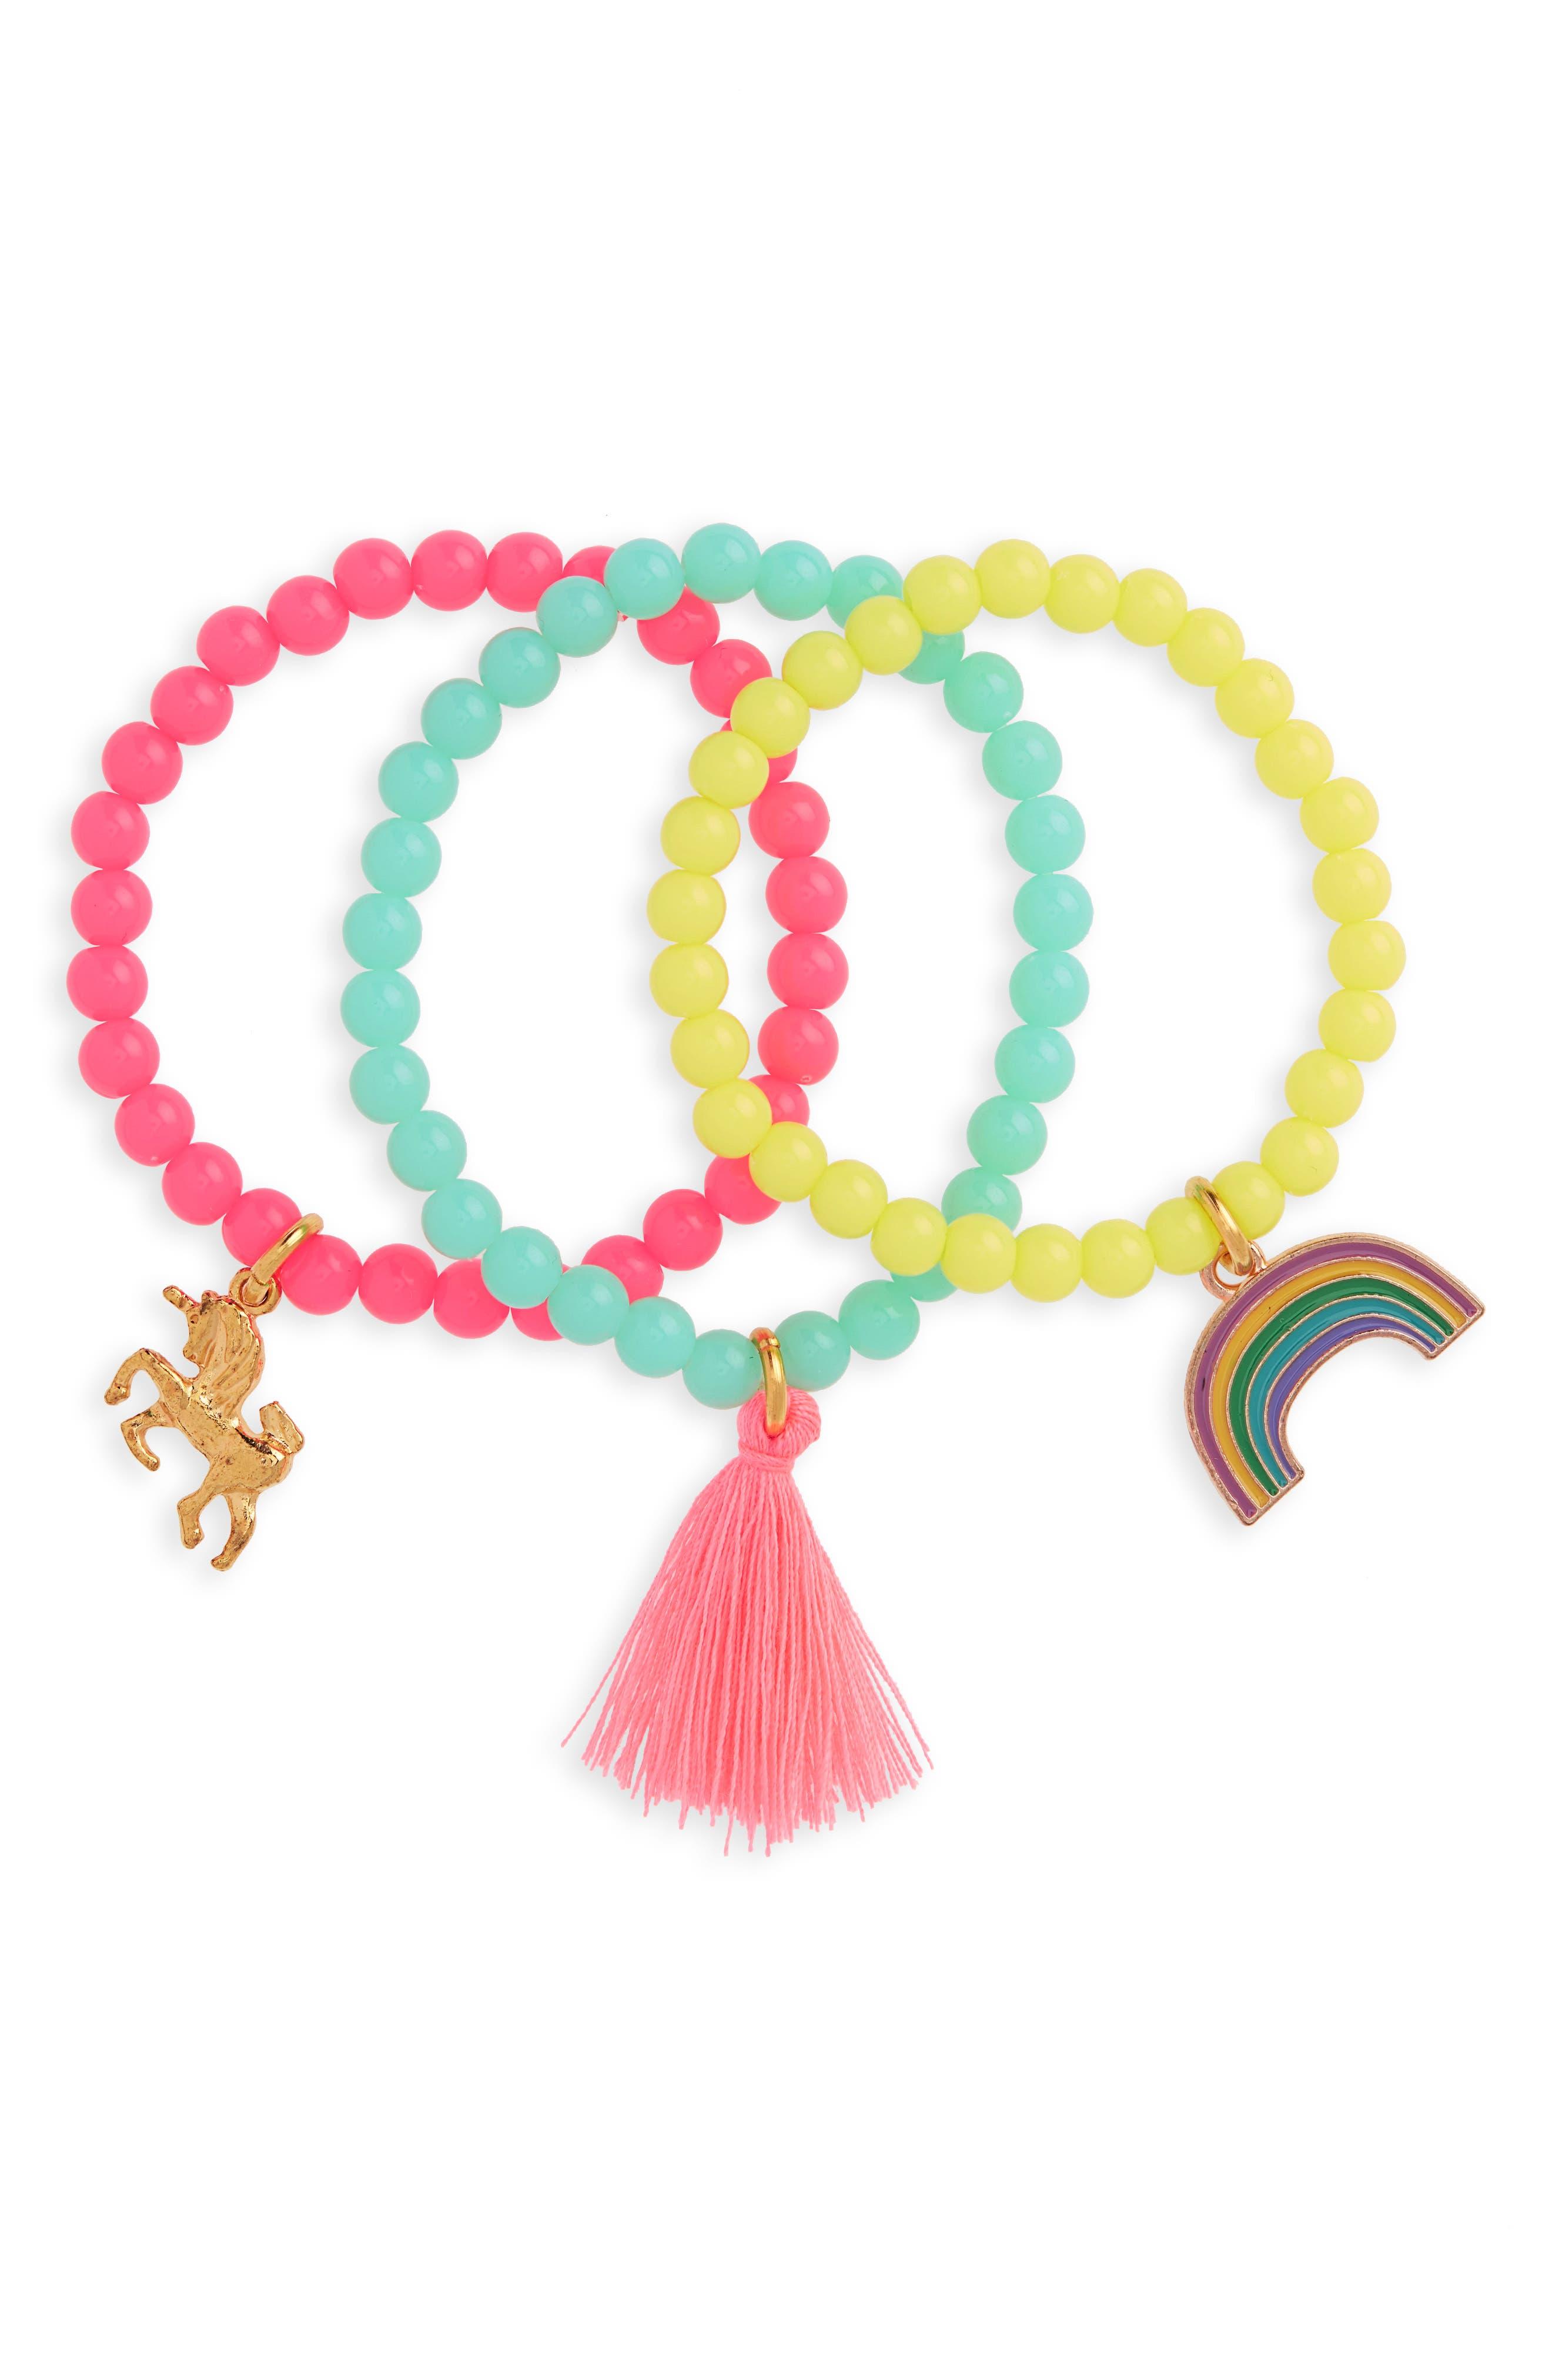 3-Pack Beaded Bracelets,                         Main,                         color, CORAL